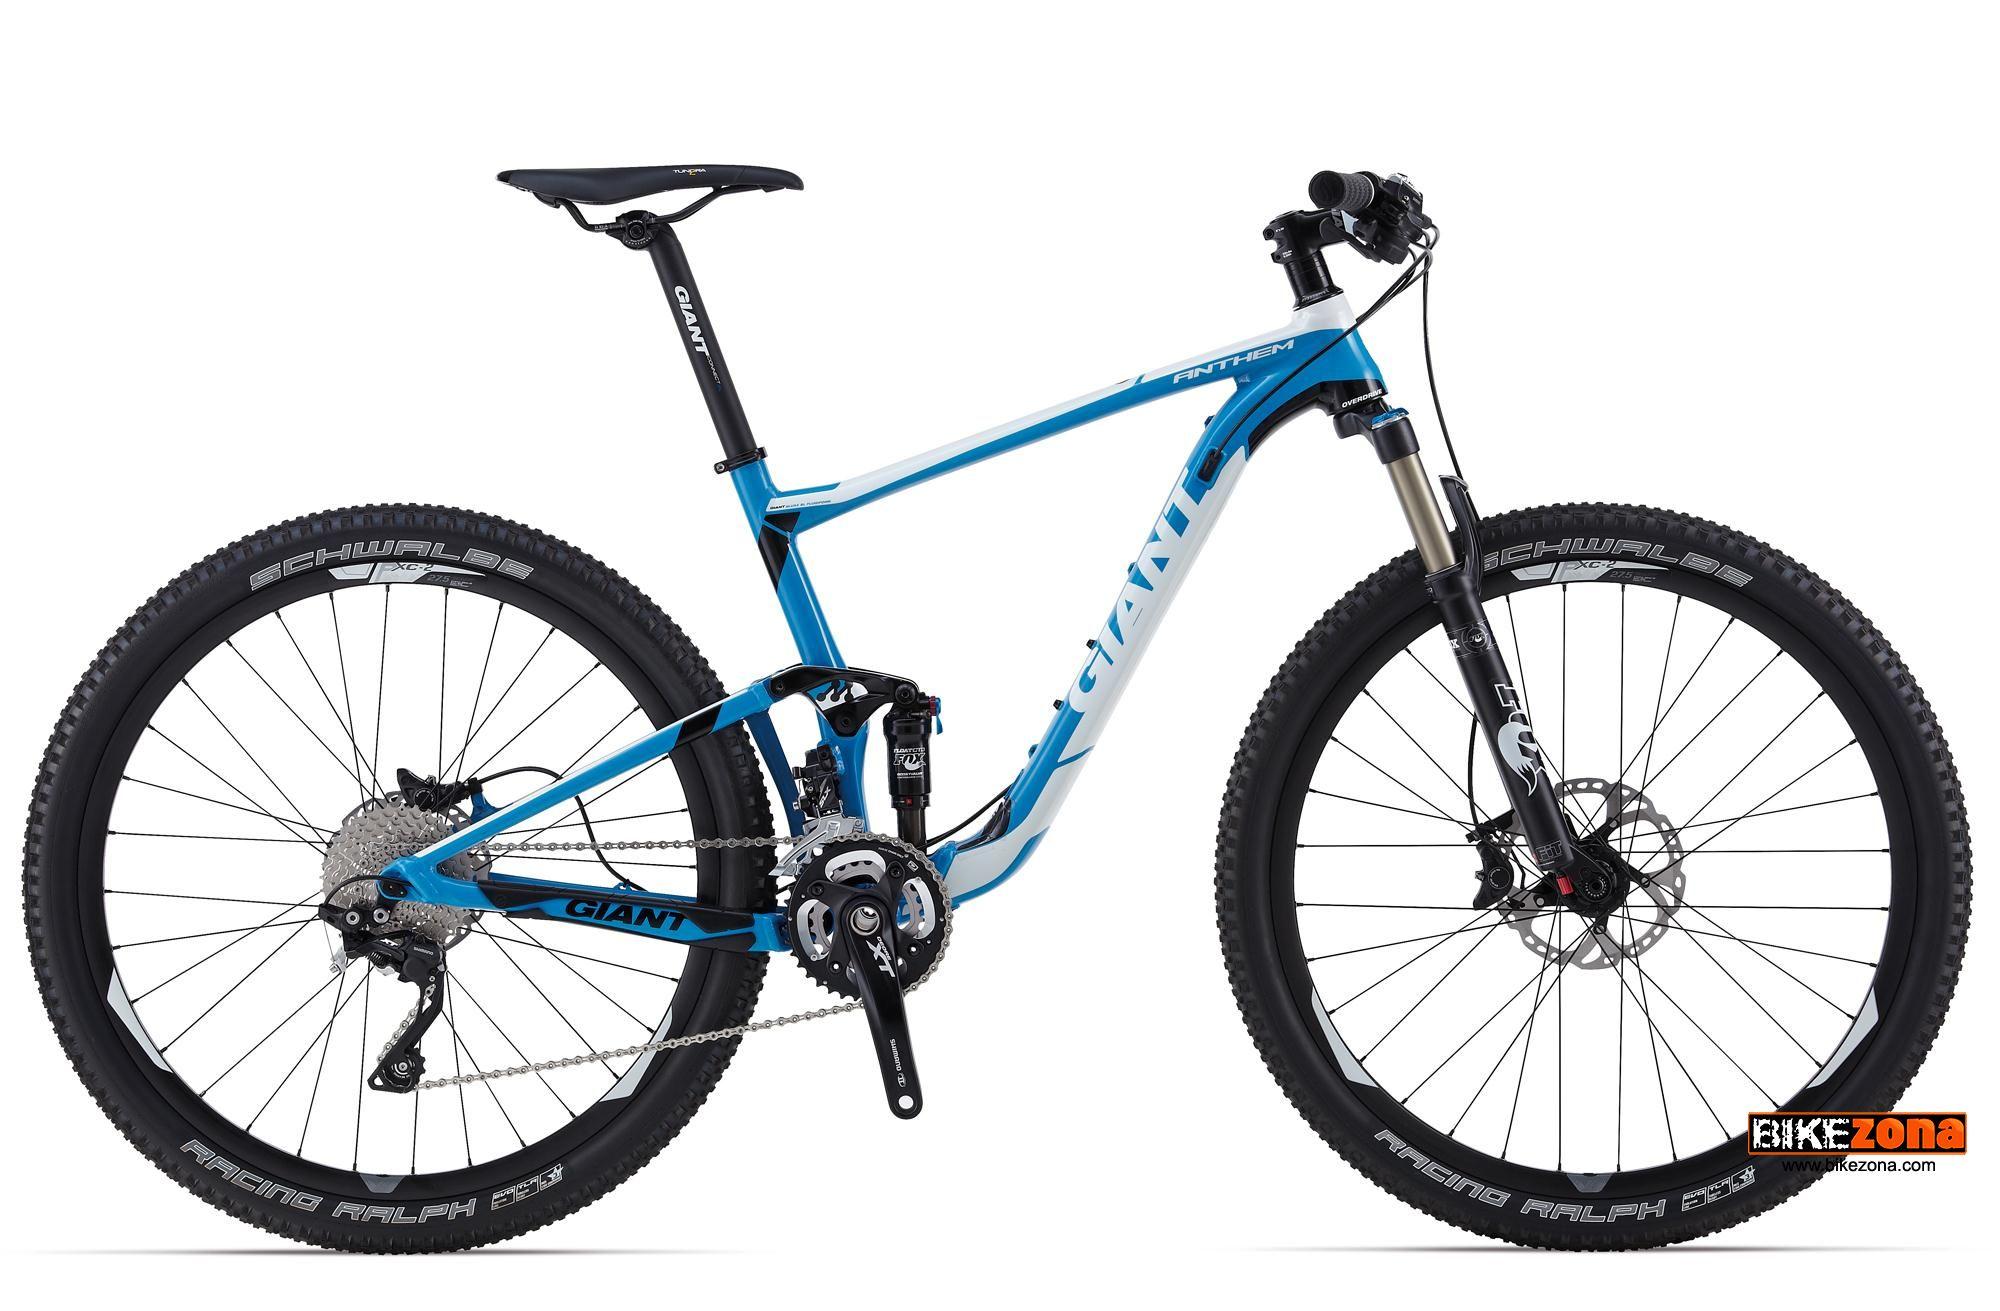 GIANT ANTHEM ADVANCED 27.5 O TEAM (2014) Bicicletas MTB - DOBLE XC | Catalógo bicicletas en ...